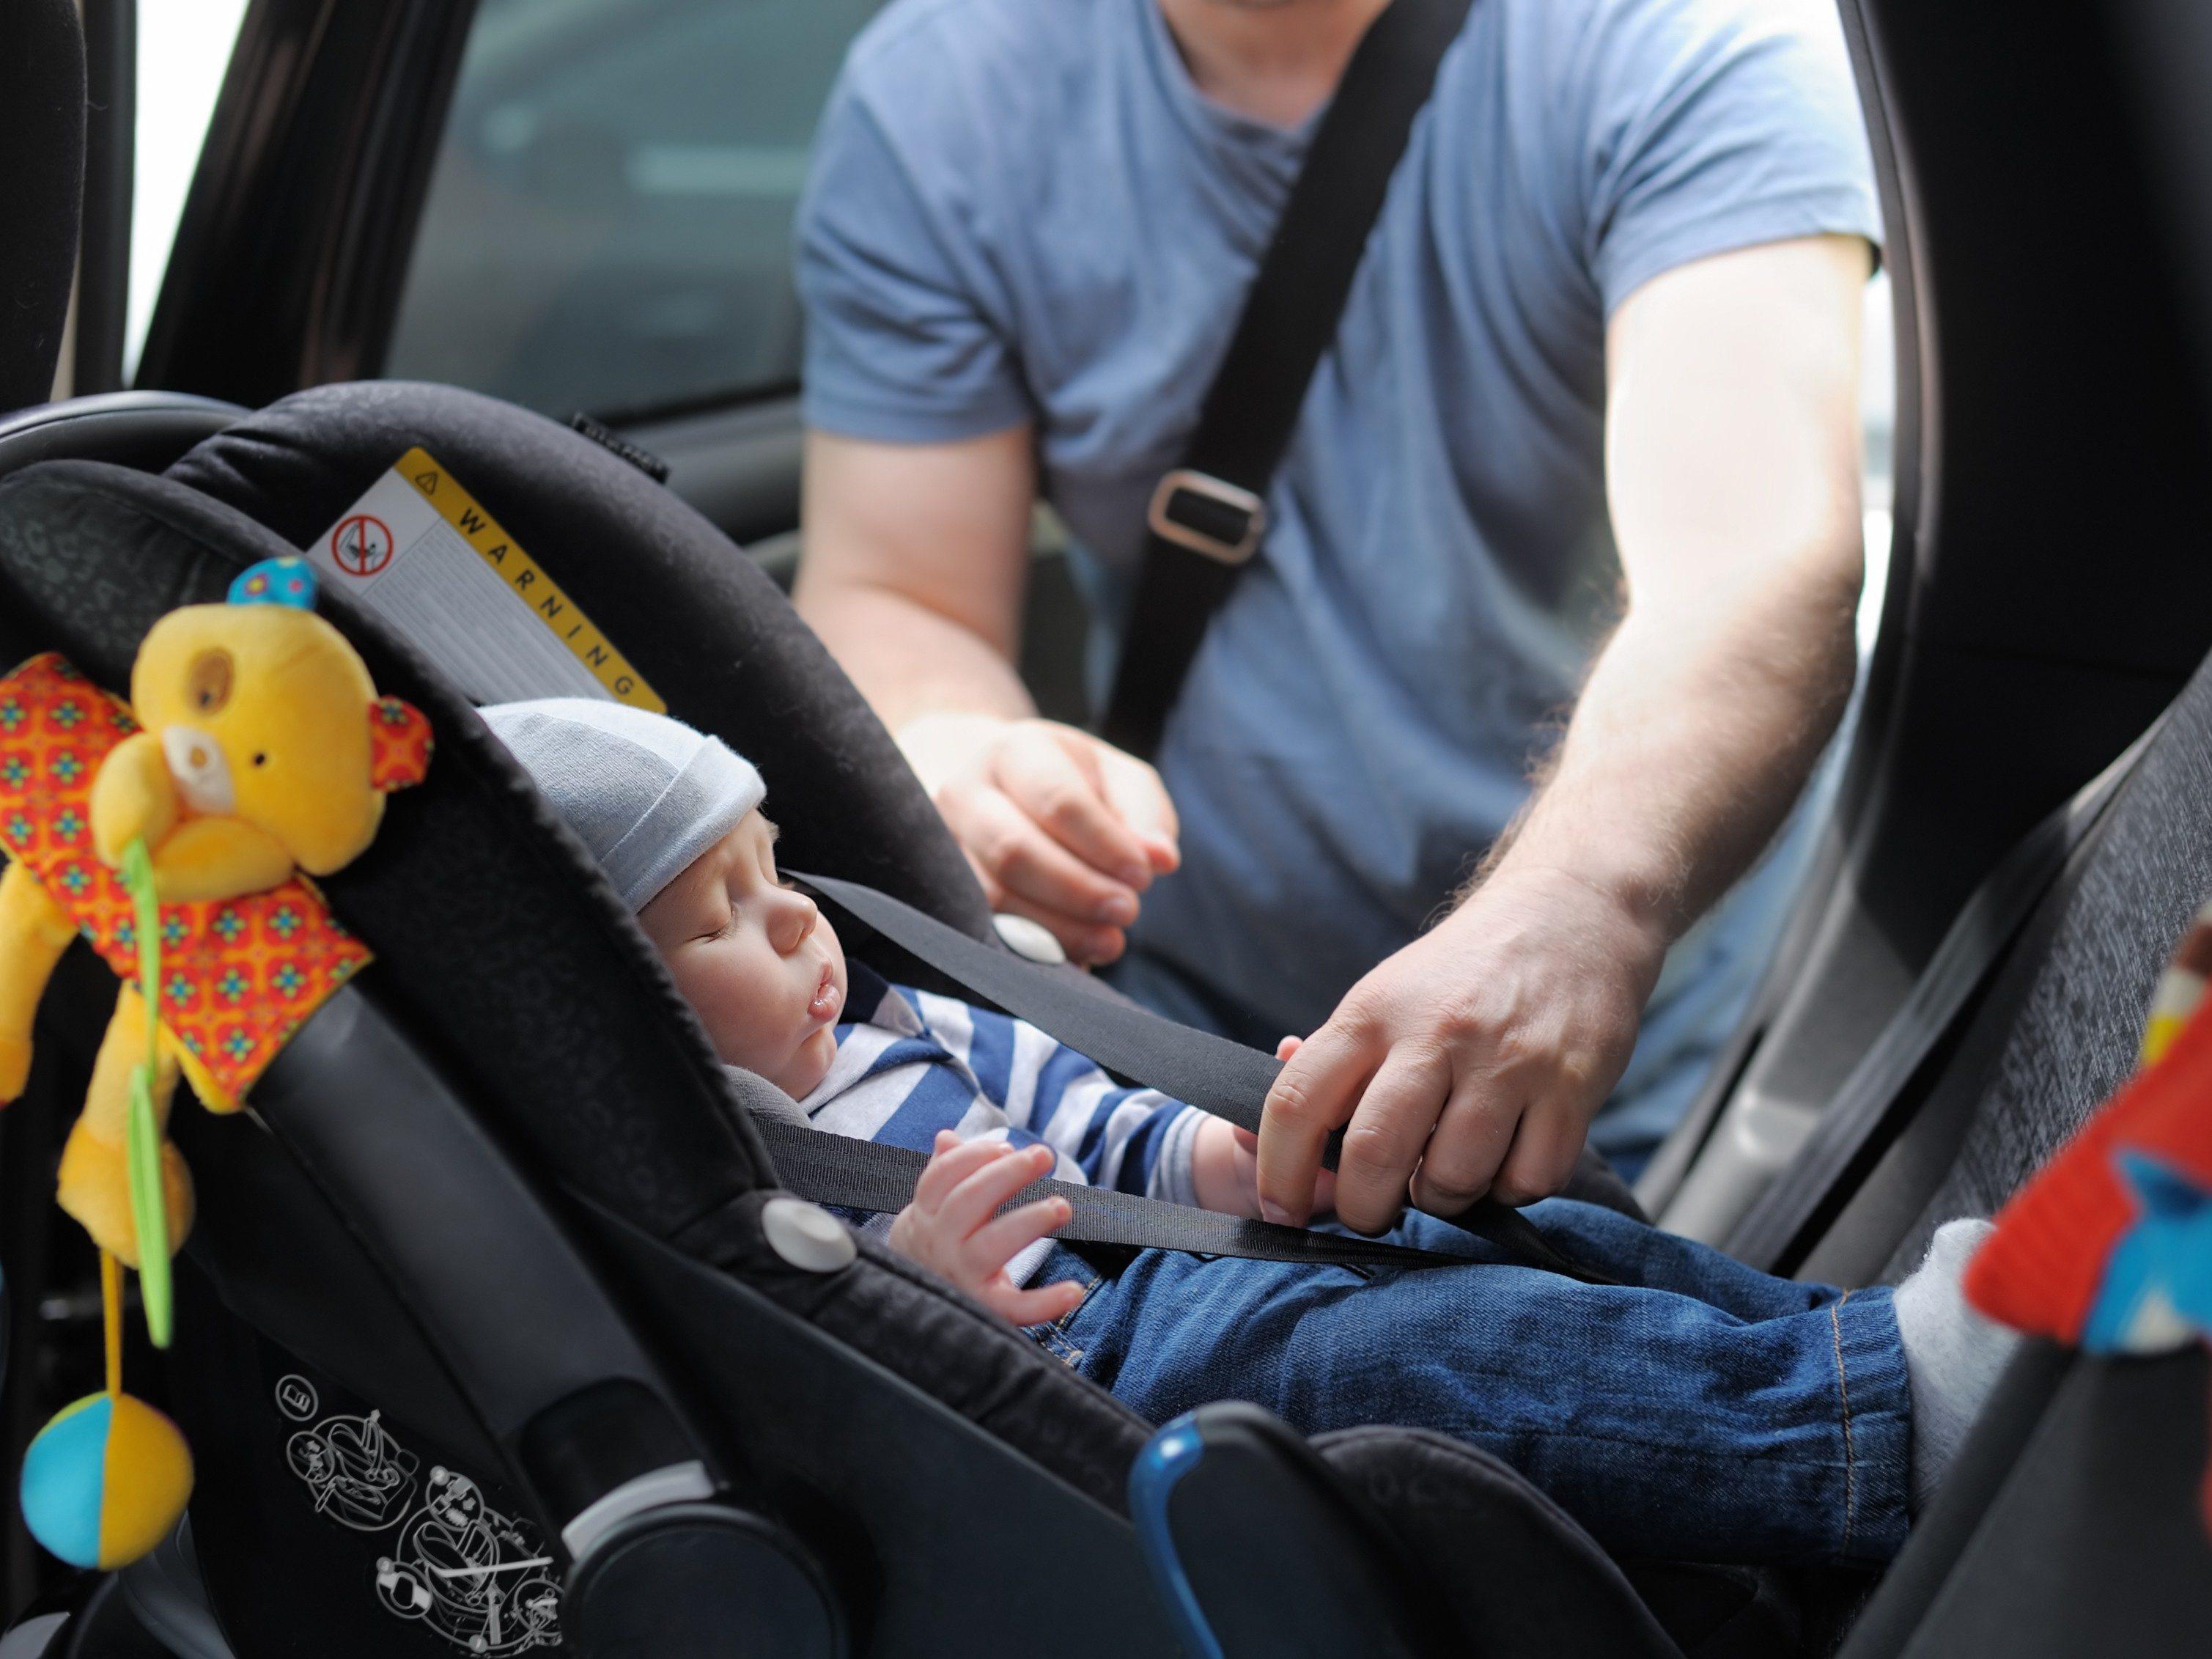 1. Child's Car Seat